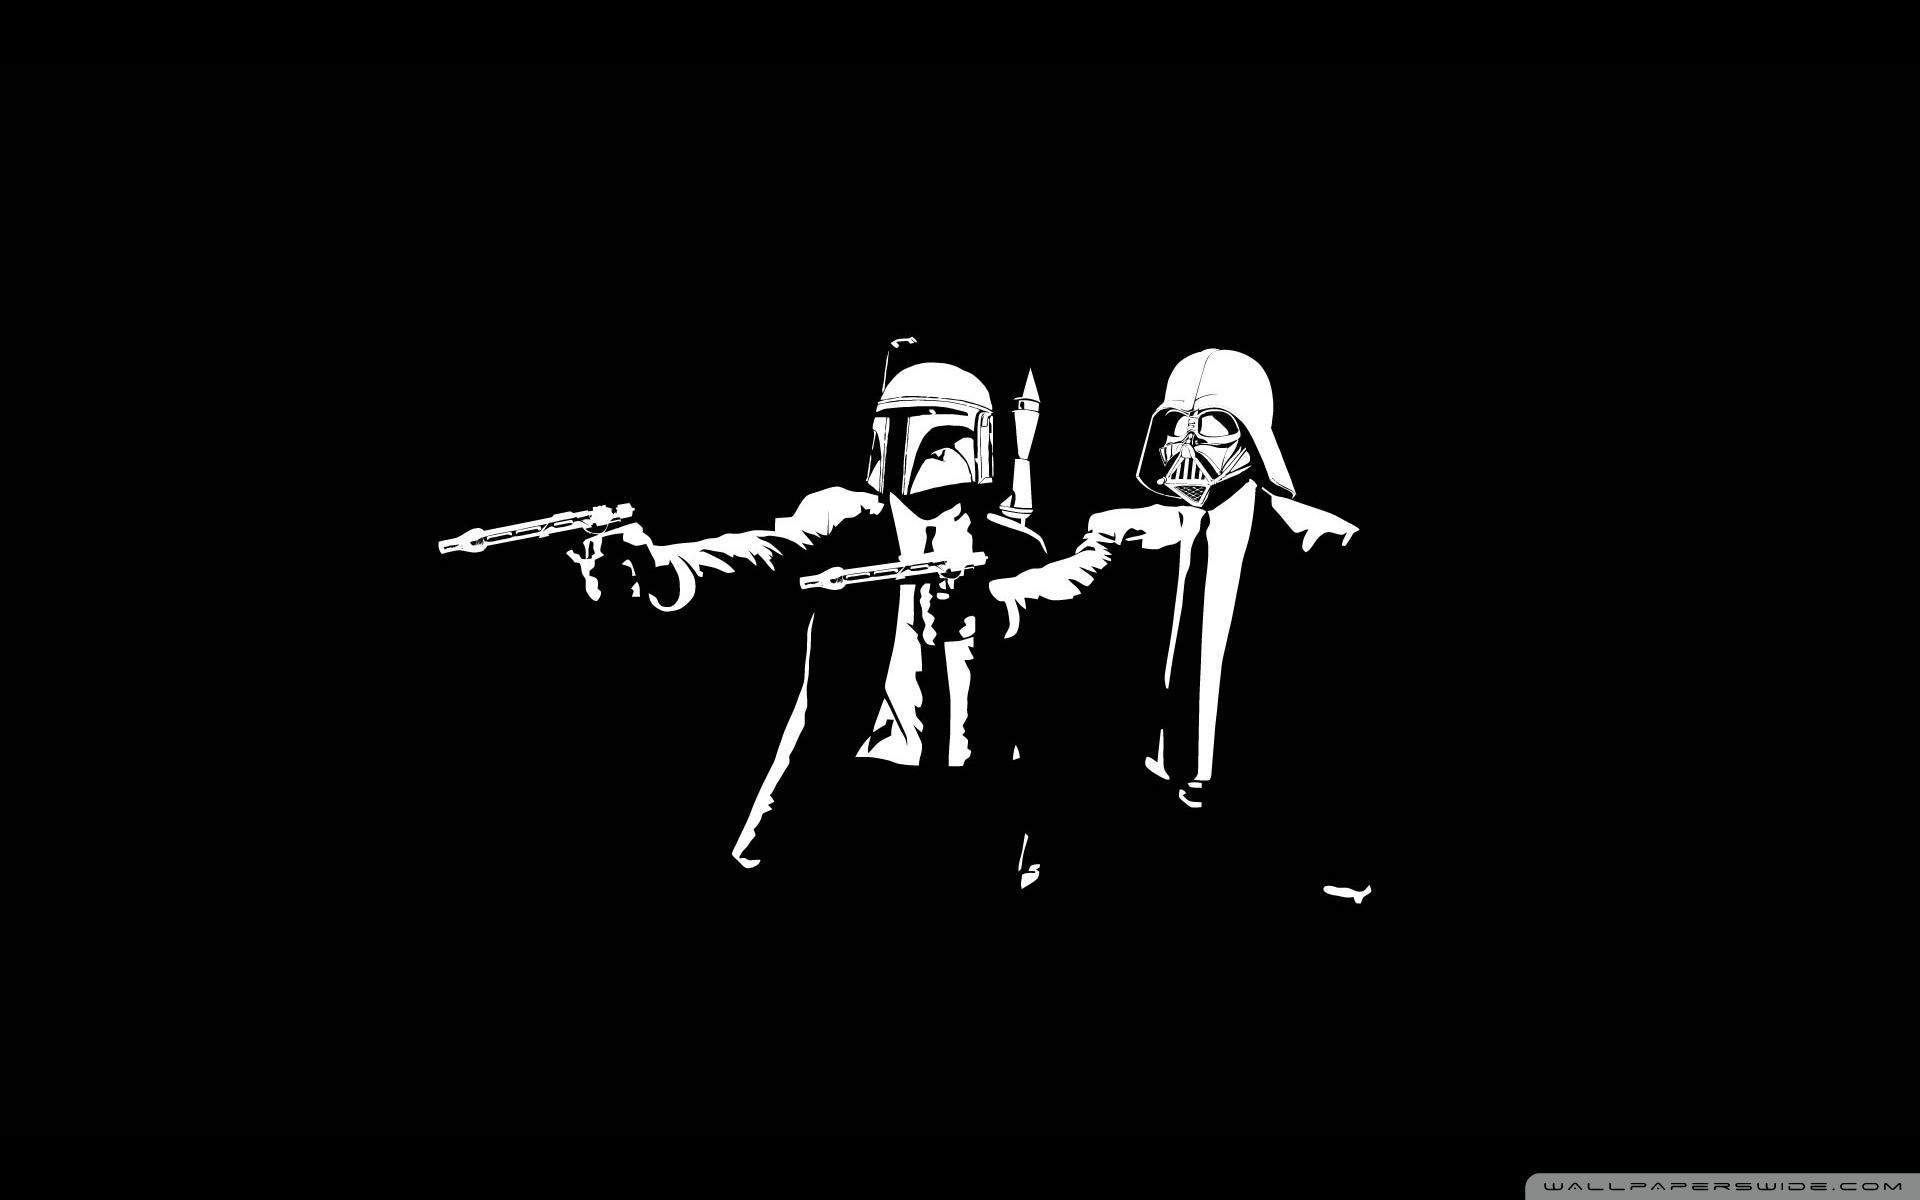 Free Download Star Wars Pulp Fiction 4k Hd Desktop Wallpaper